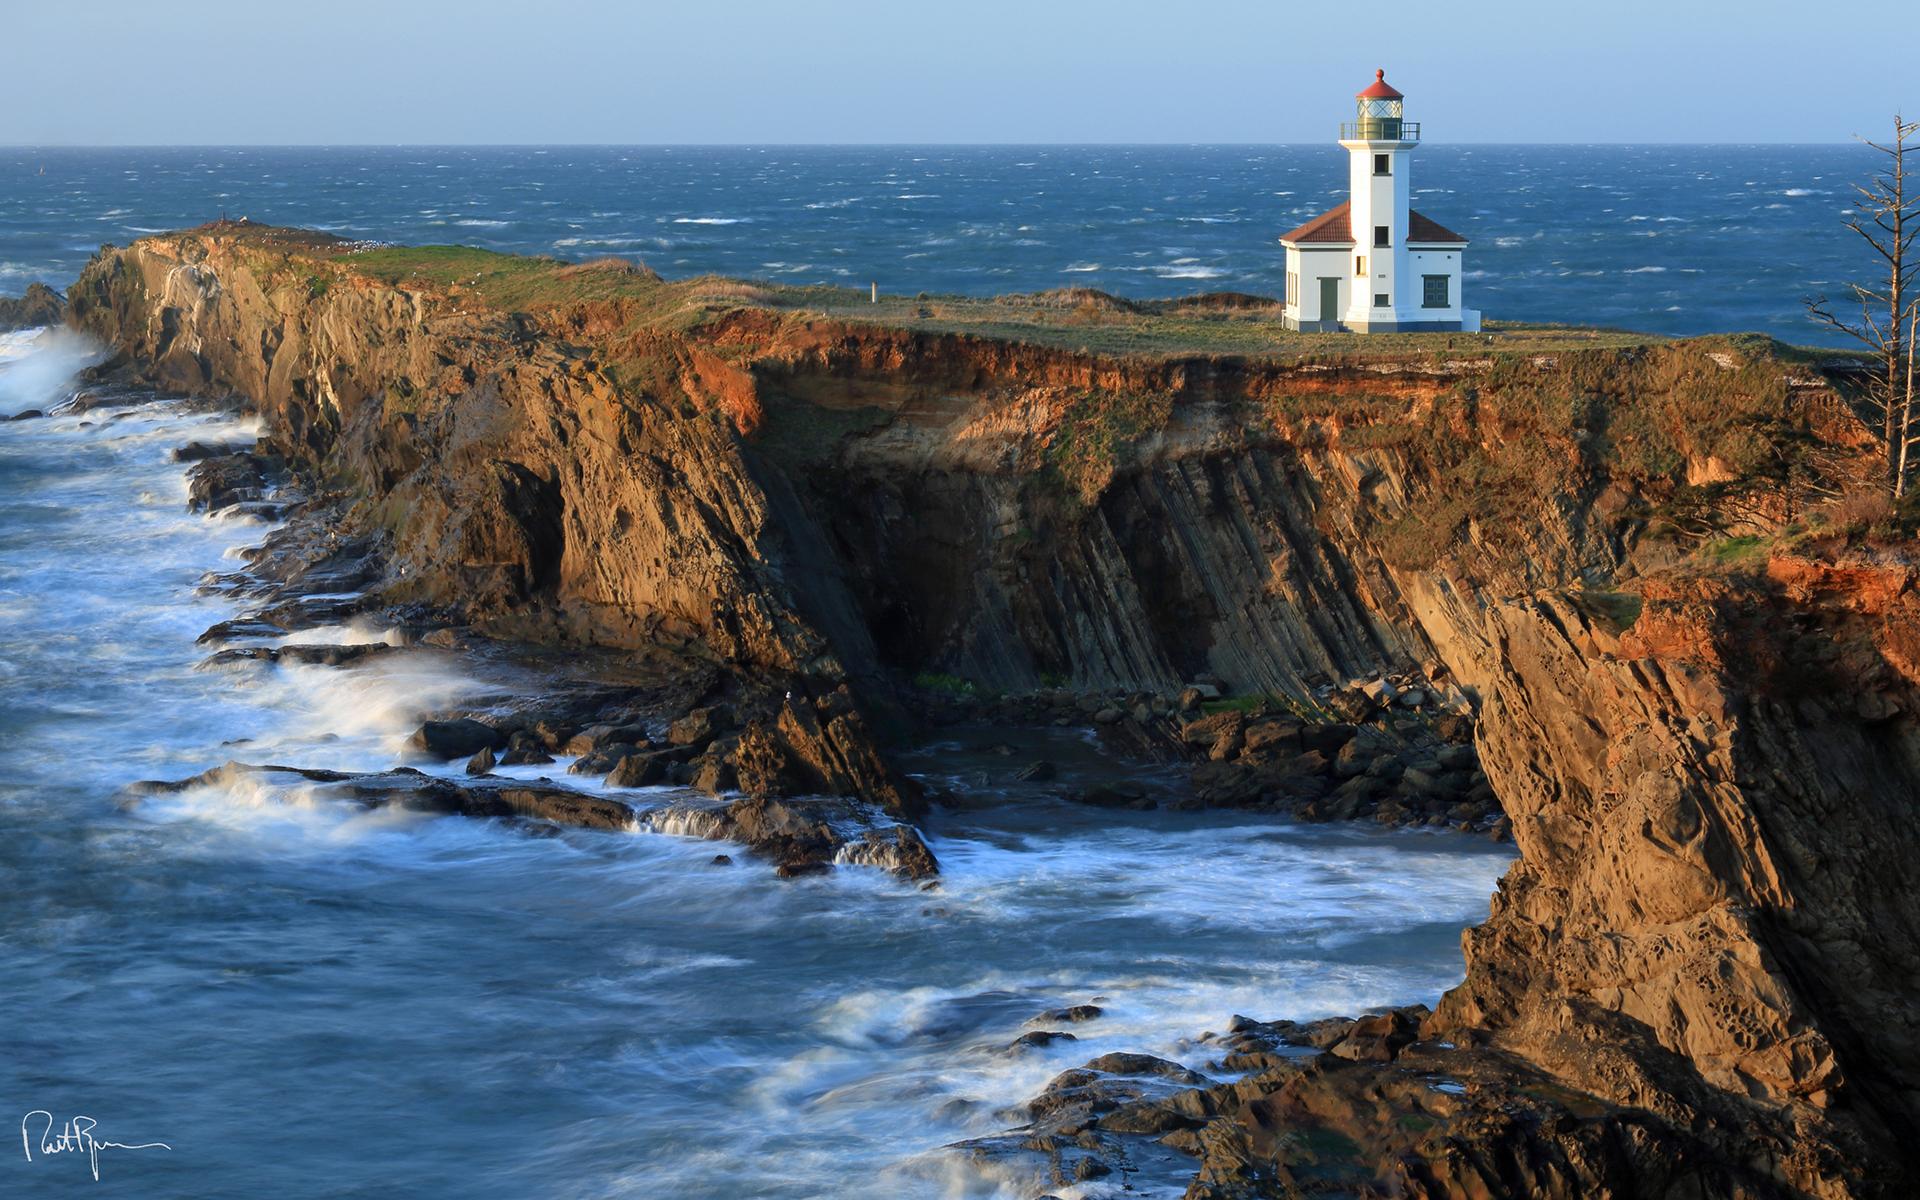 Lighthouse Coast Ocean Cliff sea shore coast buildings architecture 1920x1200